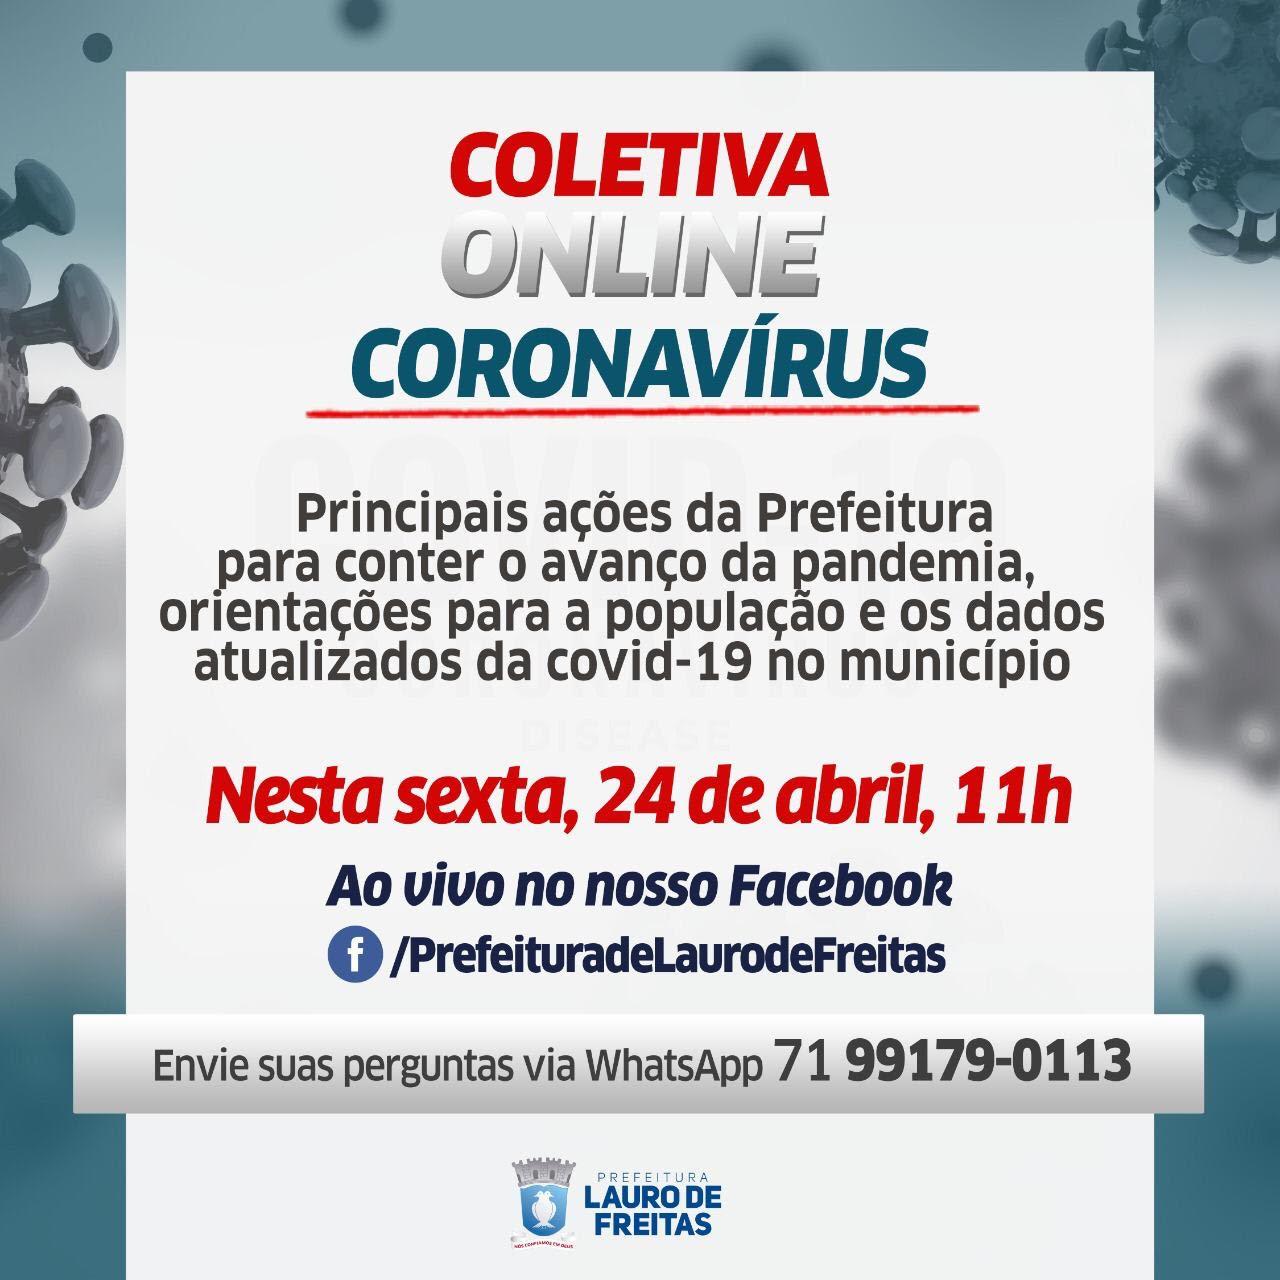 Coronavírus: Prefeitura de Lauro de Freitas realiza coletiva online, nesta sexta, às 11